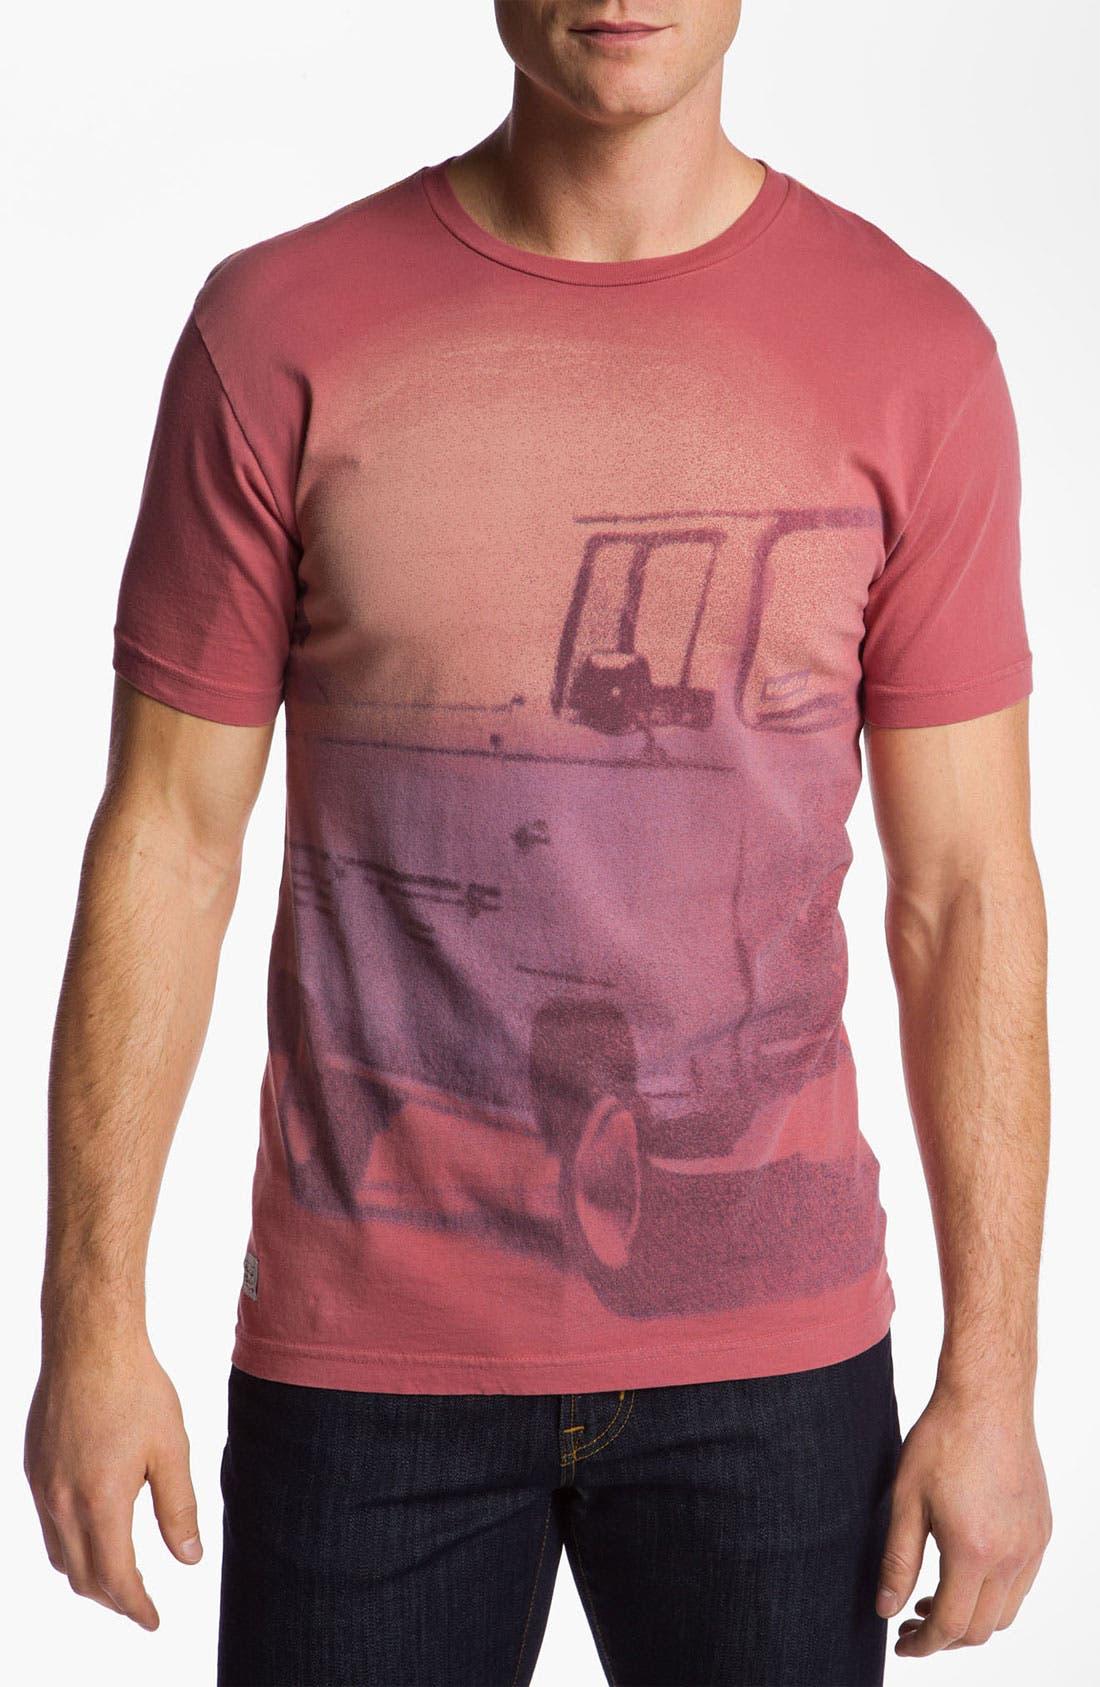 Alternate Image 1 Selected - Katin 'VDub' T-Shirt